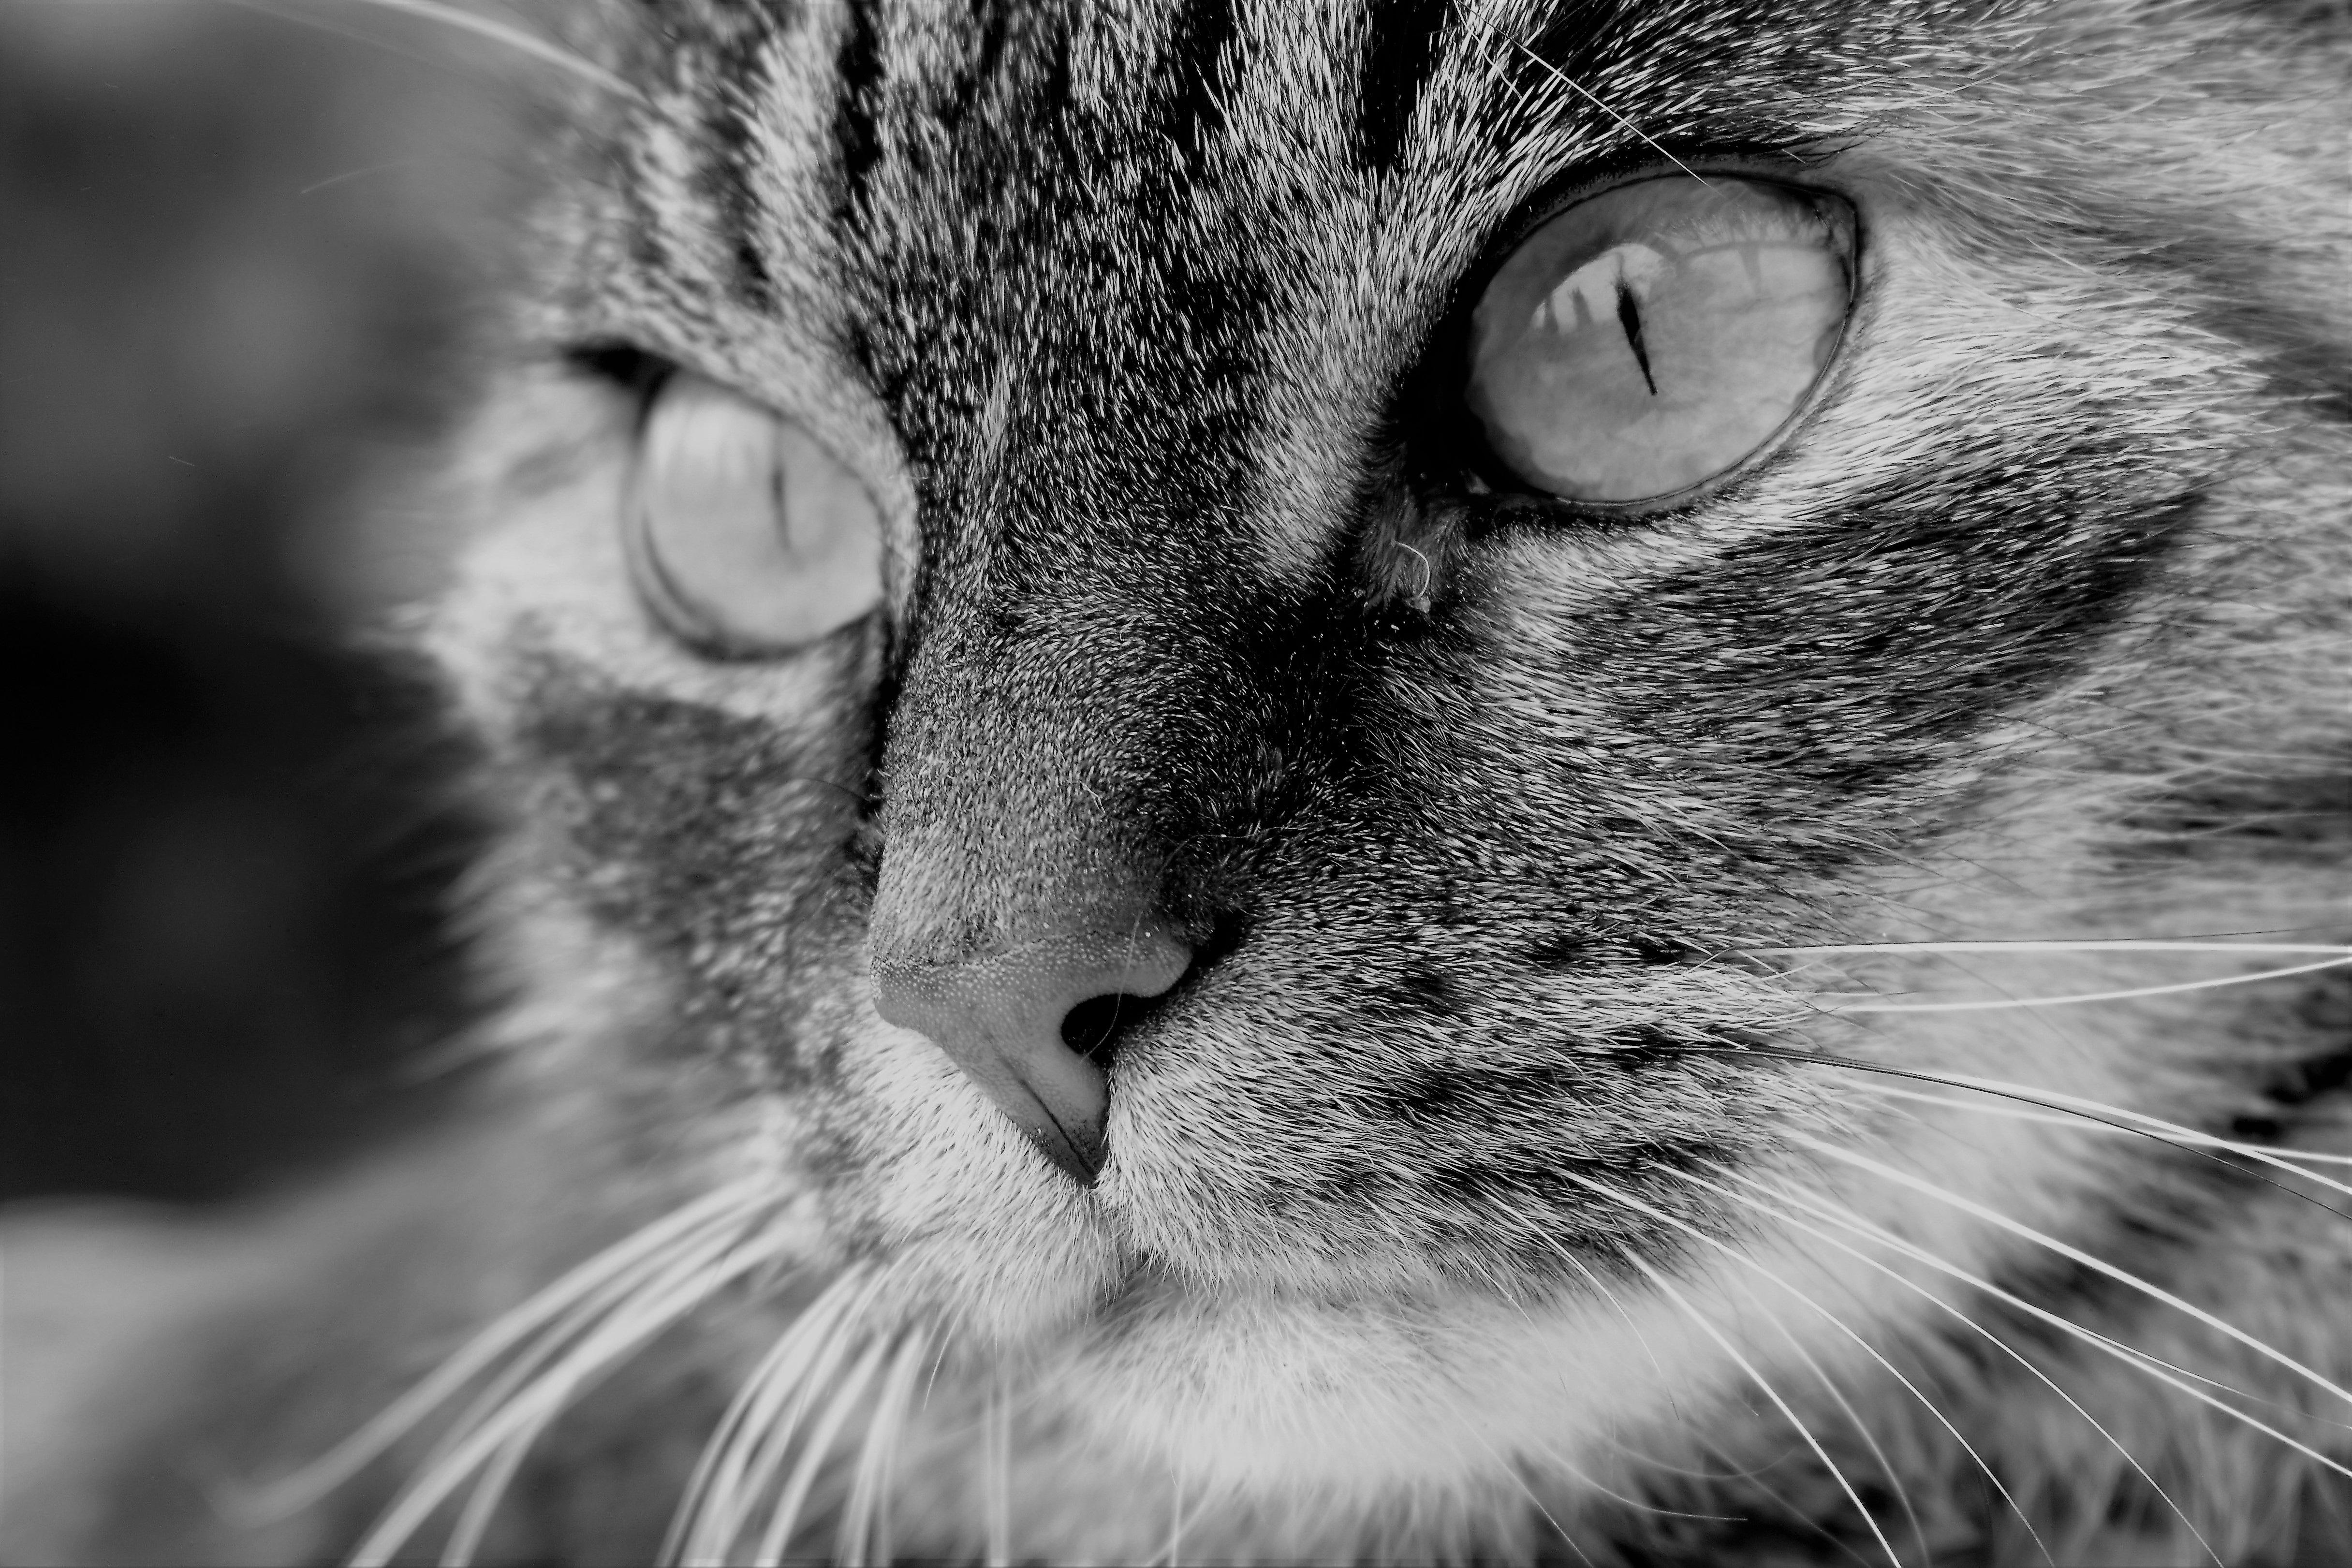 94 Koleksi Gambar Binatang Kumis Kucing Gratis